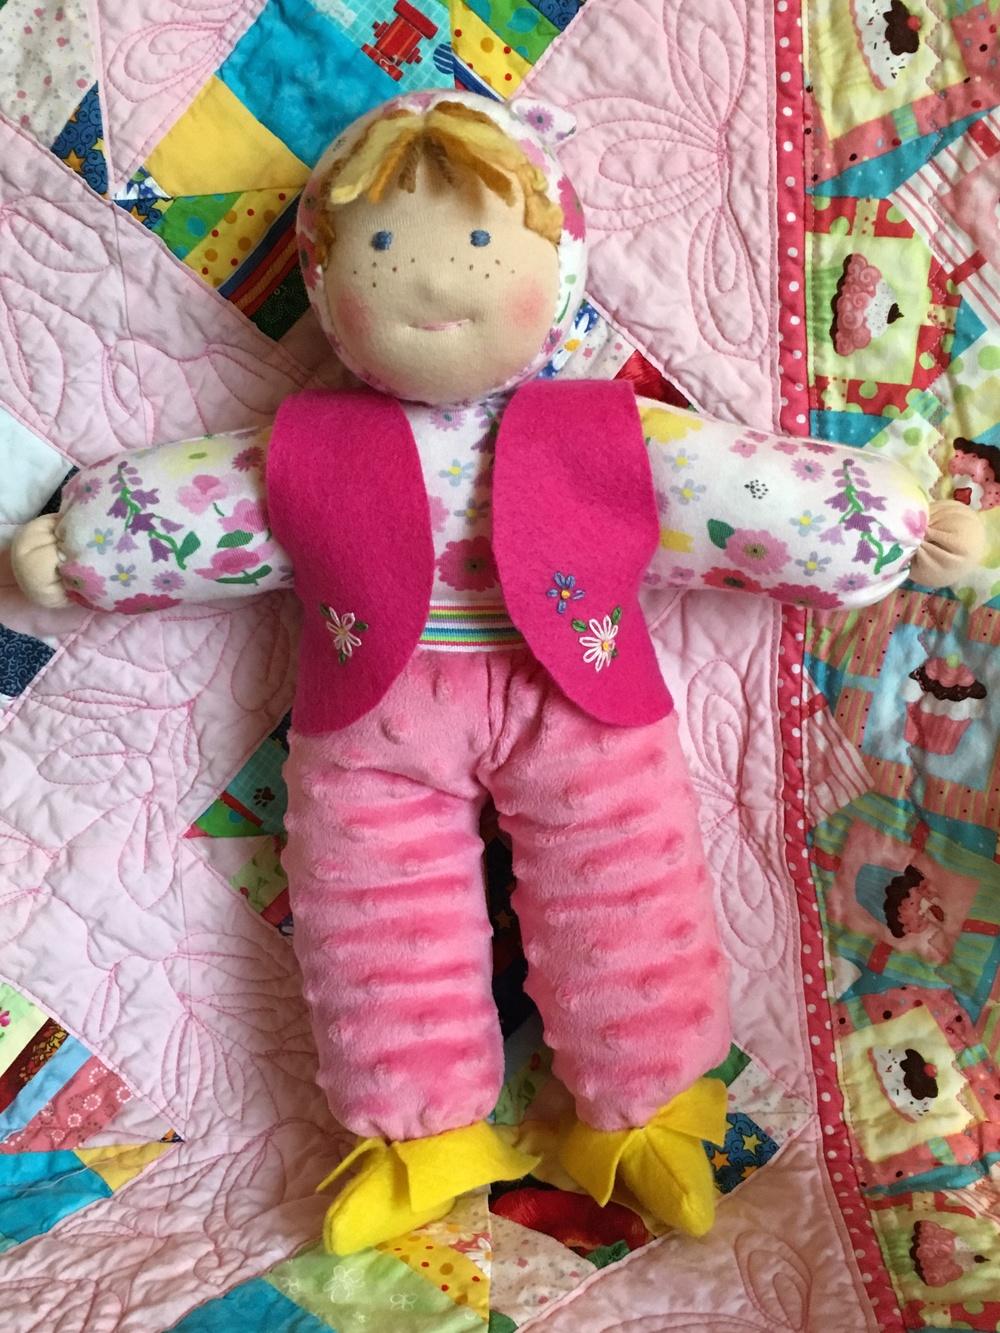 Doll Soft Waldorf doll w shoes standing.jpg